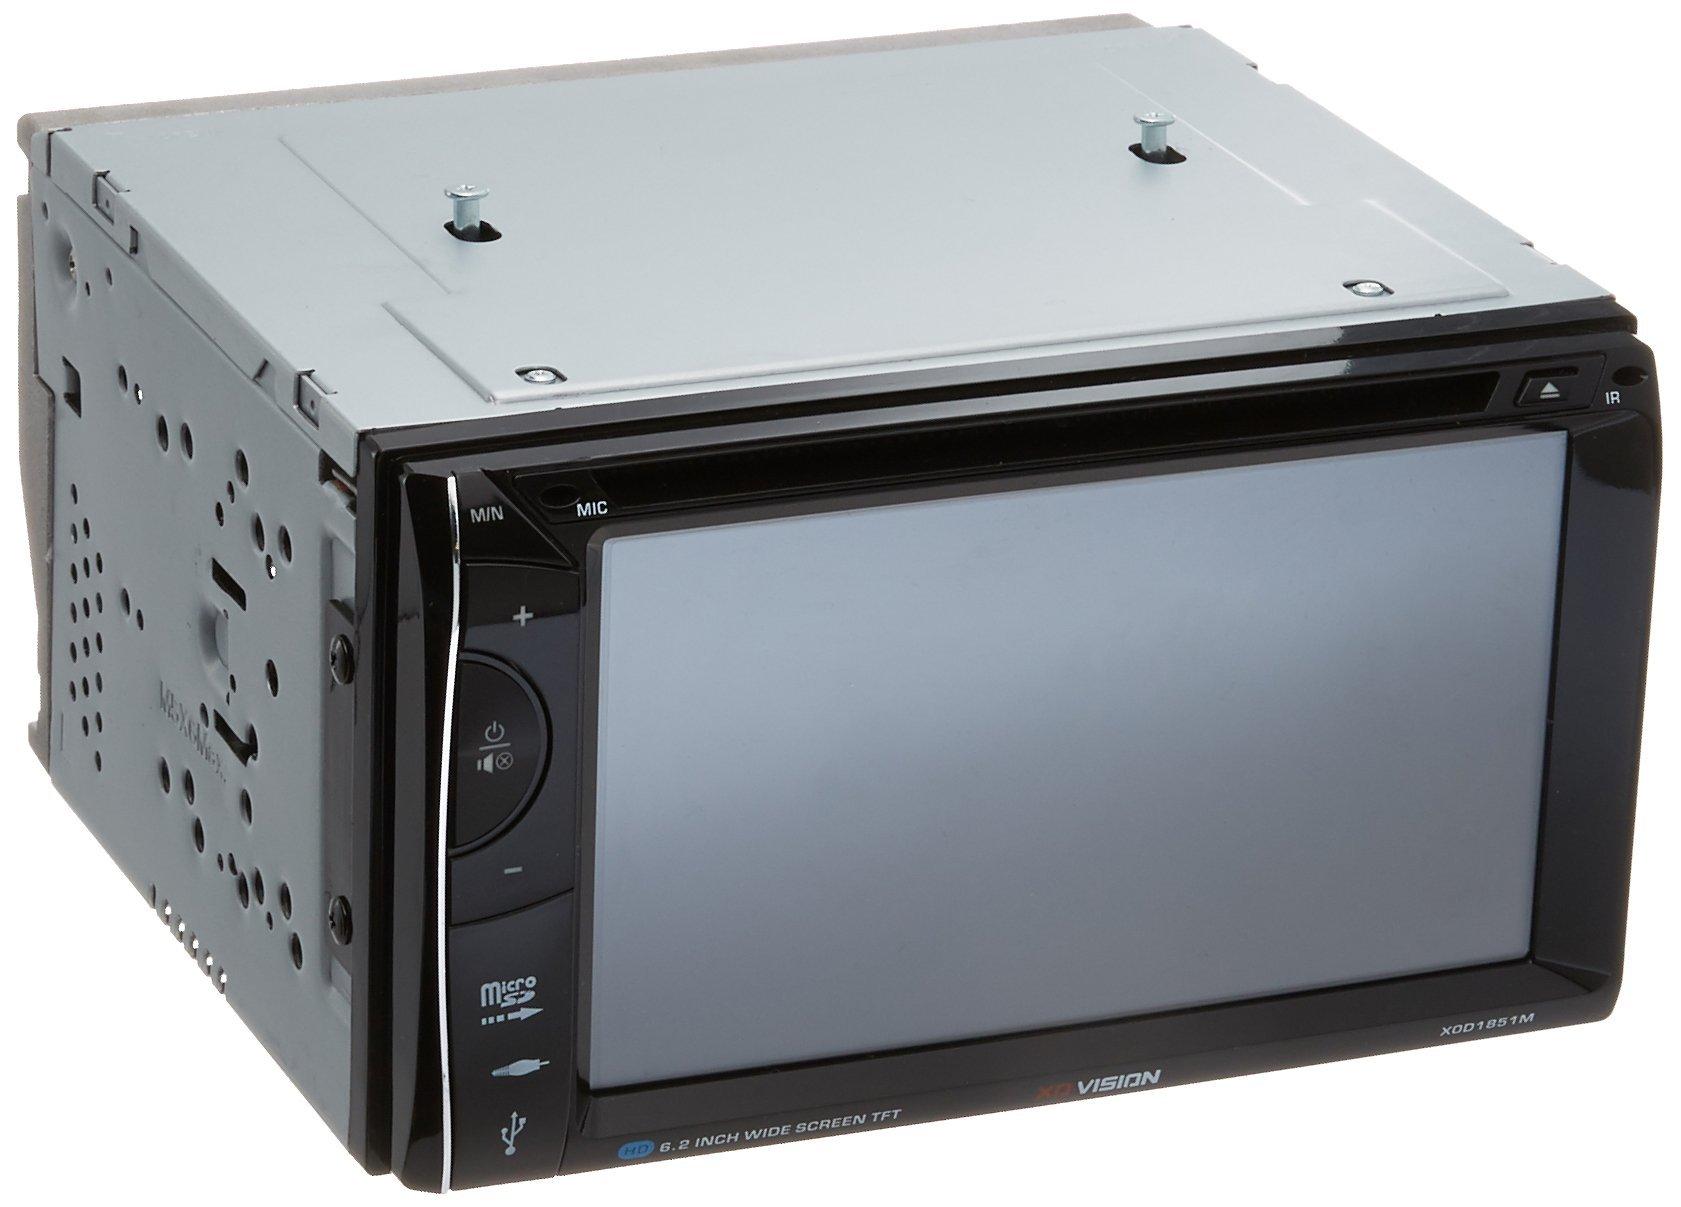 XO Vision XOD1851 In-Dash Double DIN 6.2'' INCH Wireless Bluetooth Touchscreen Monitor